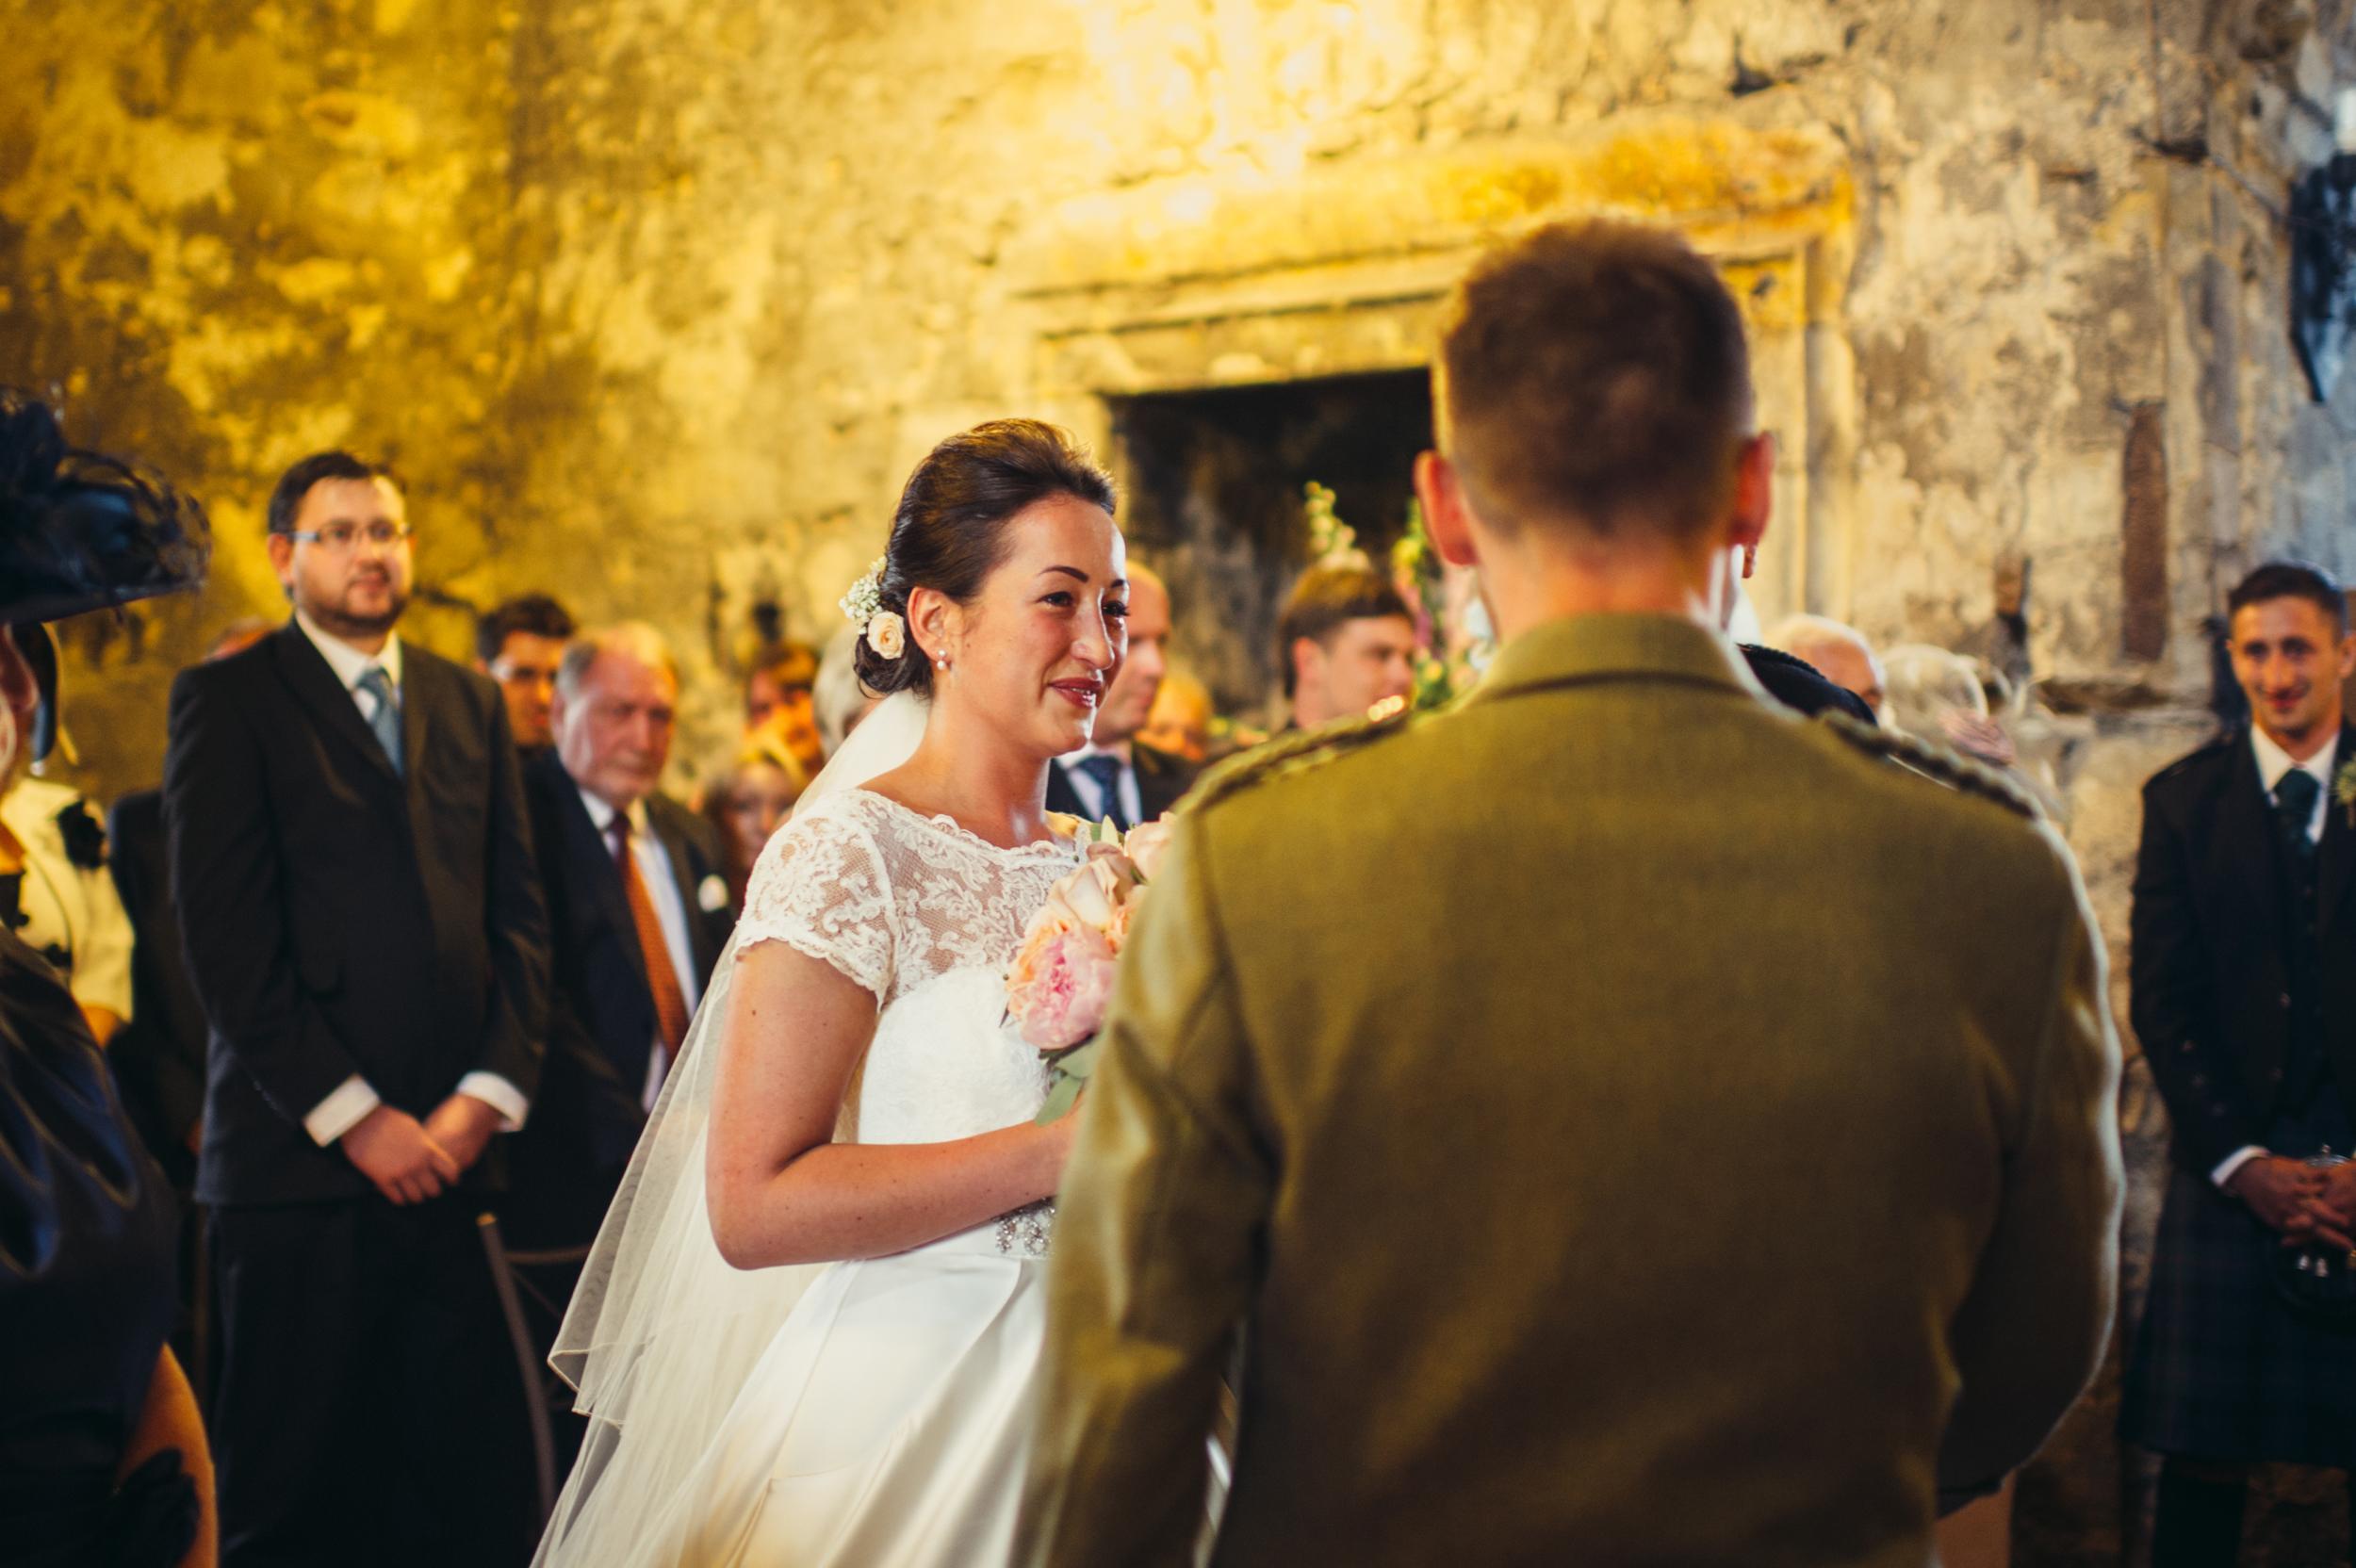 0098-lisa-devine-alternative-creative-wedding-photography-glasgow-edinburgh.JPG